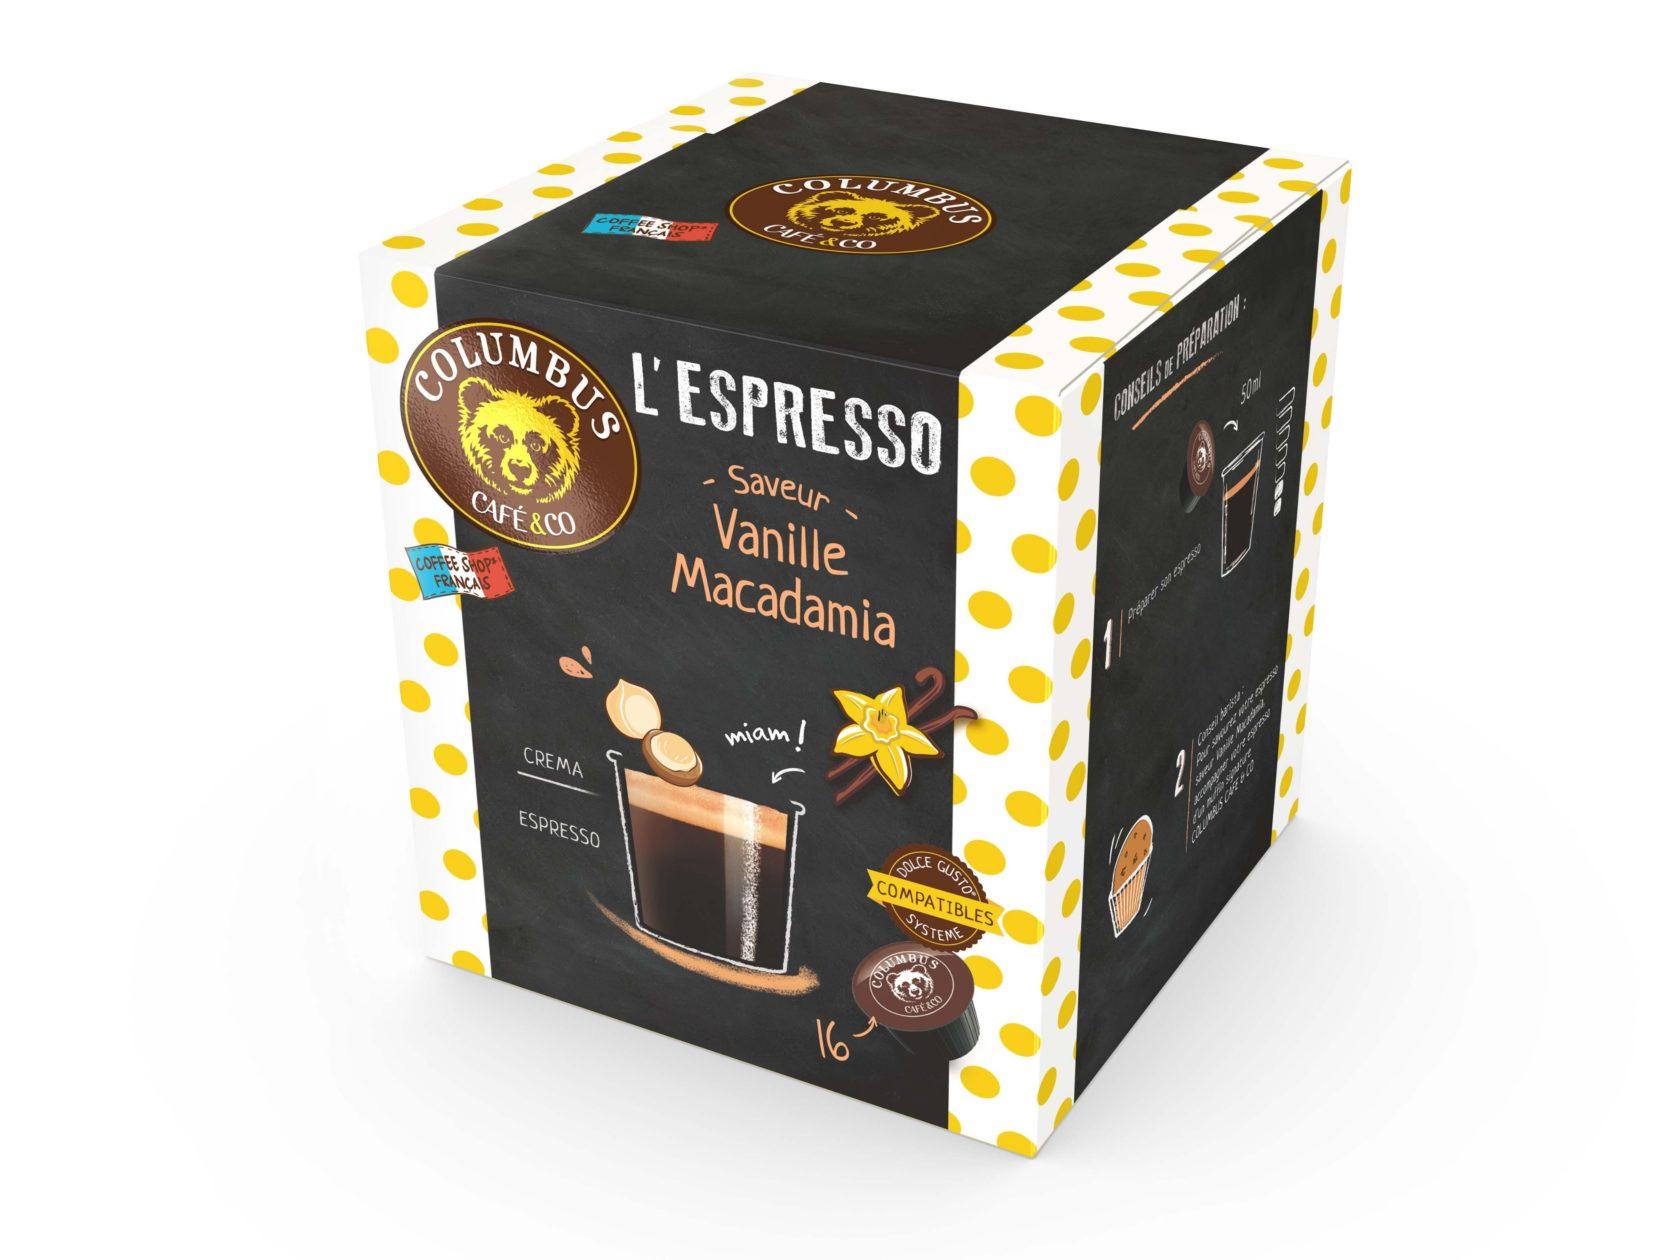 L'Espresso saveur Vanille Macadmia Dolce Gusto® x 16